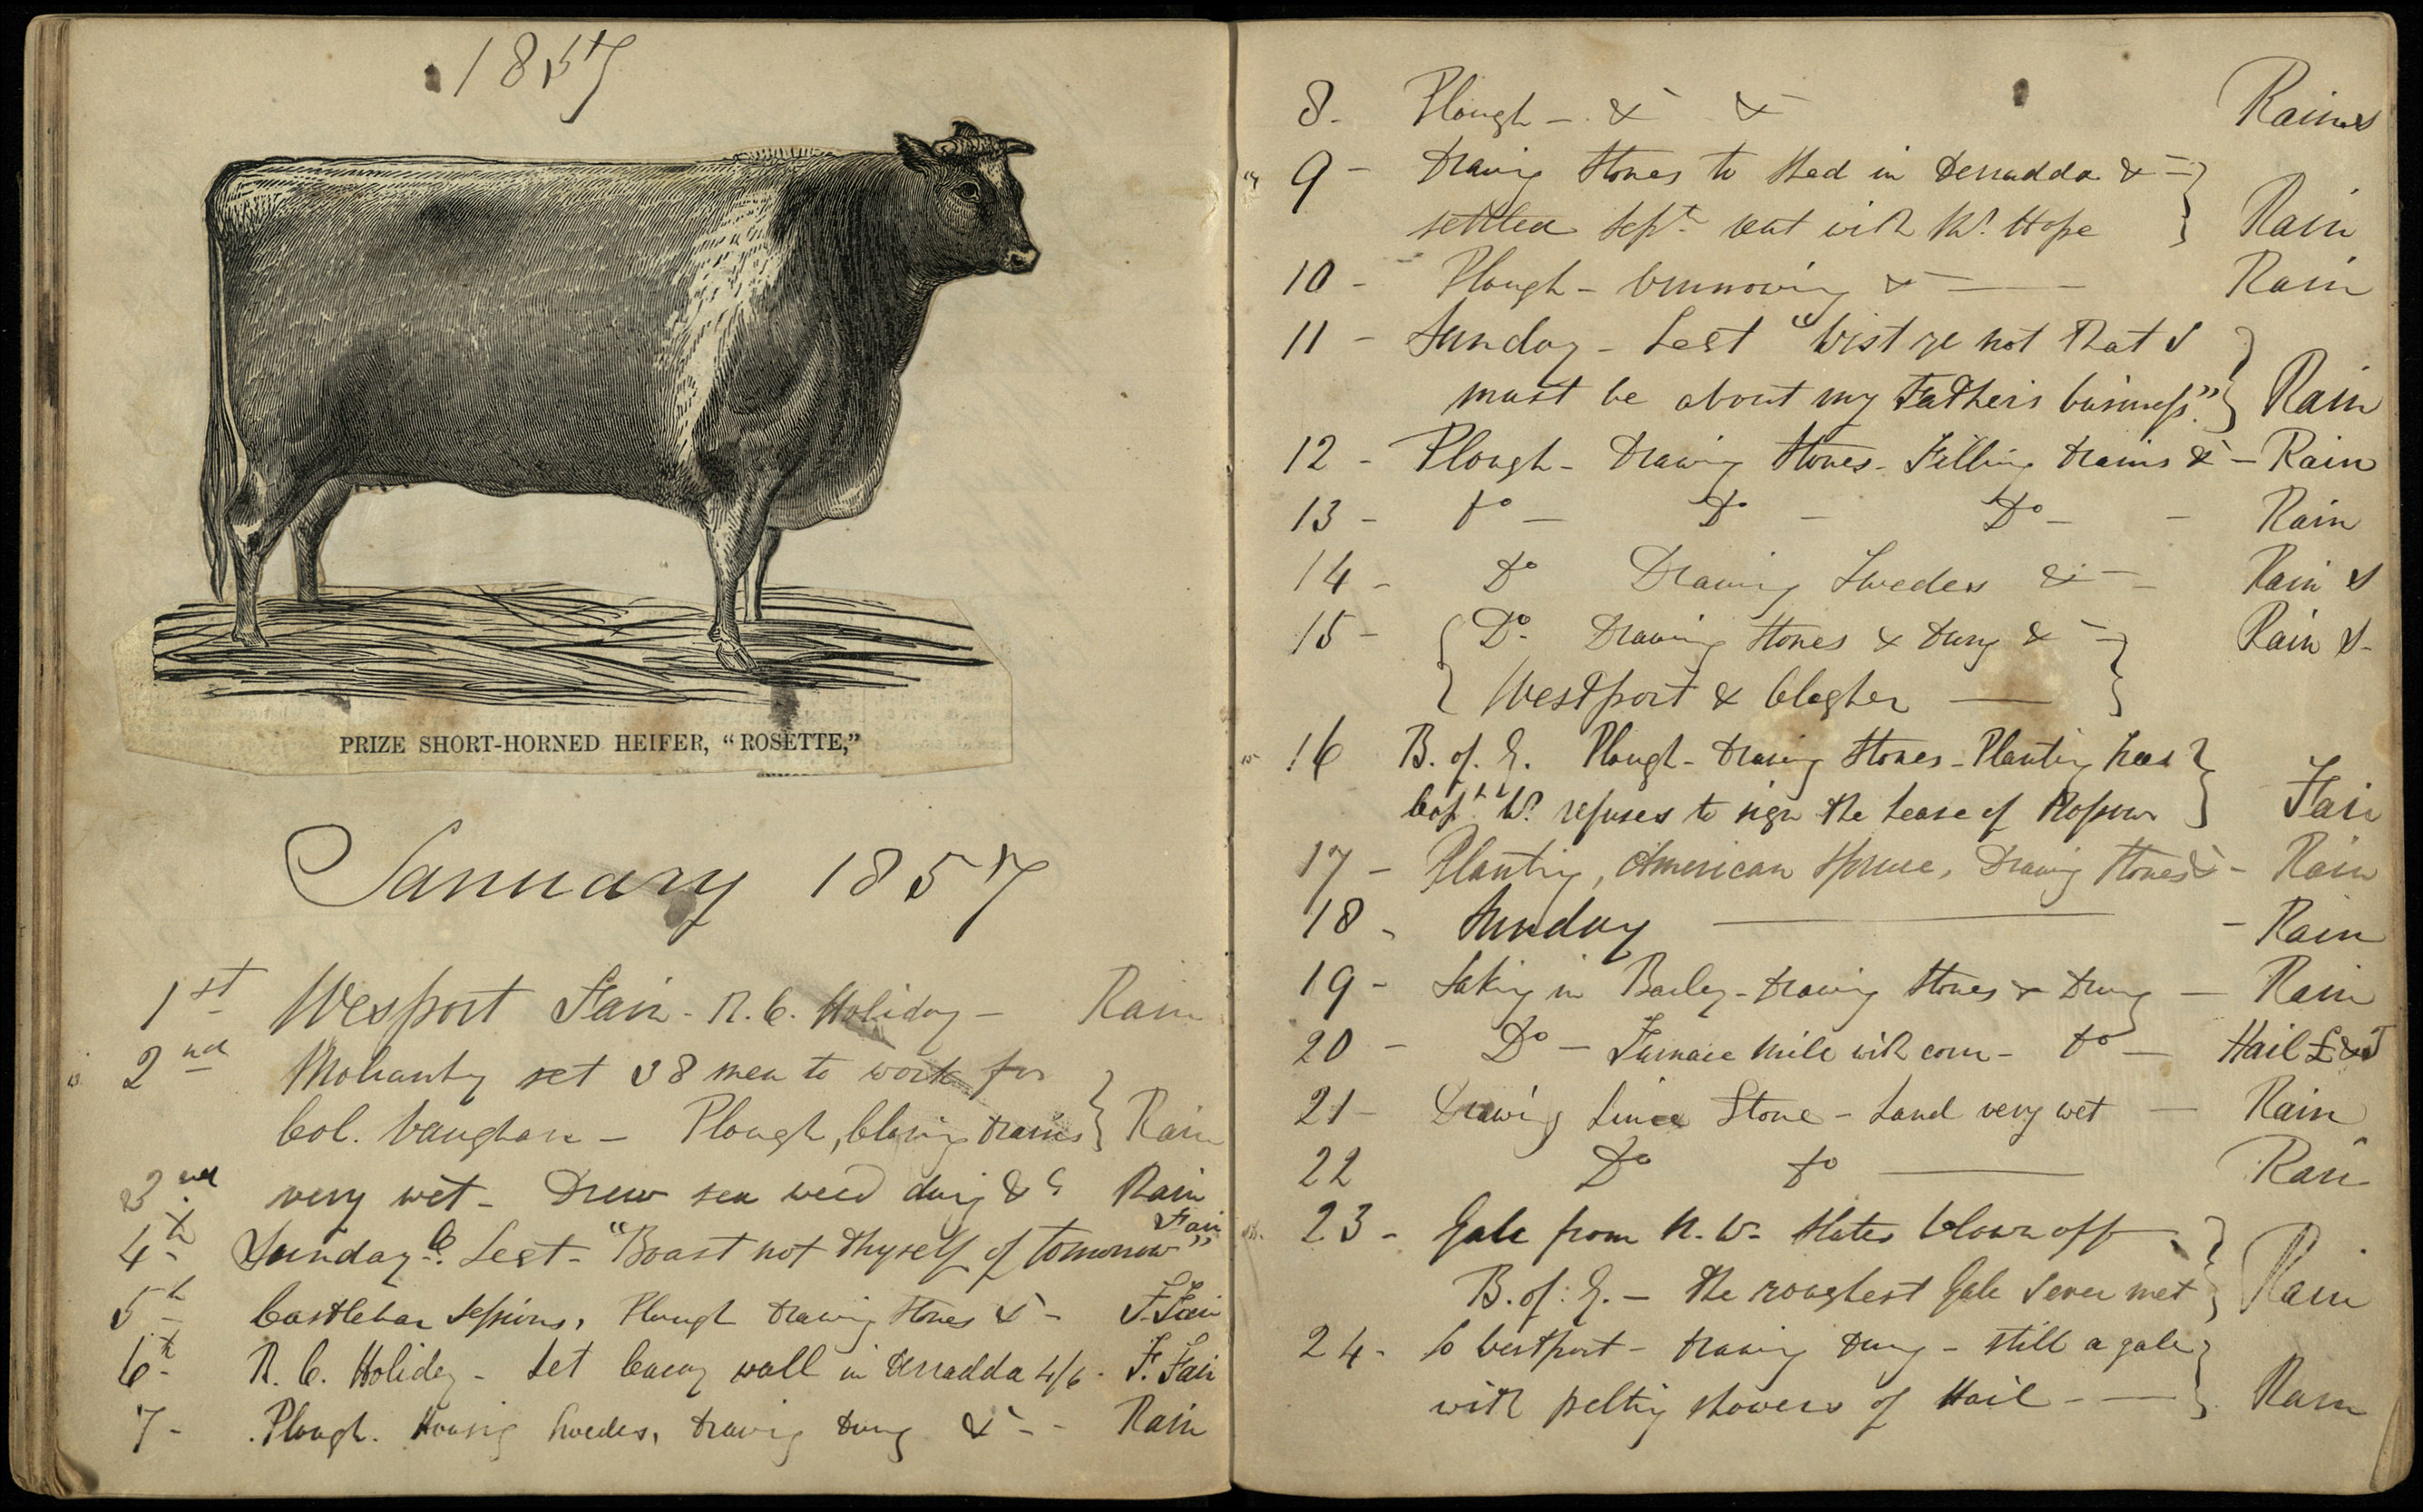 Diaries of John and Arthur Oram